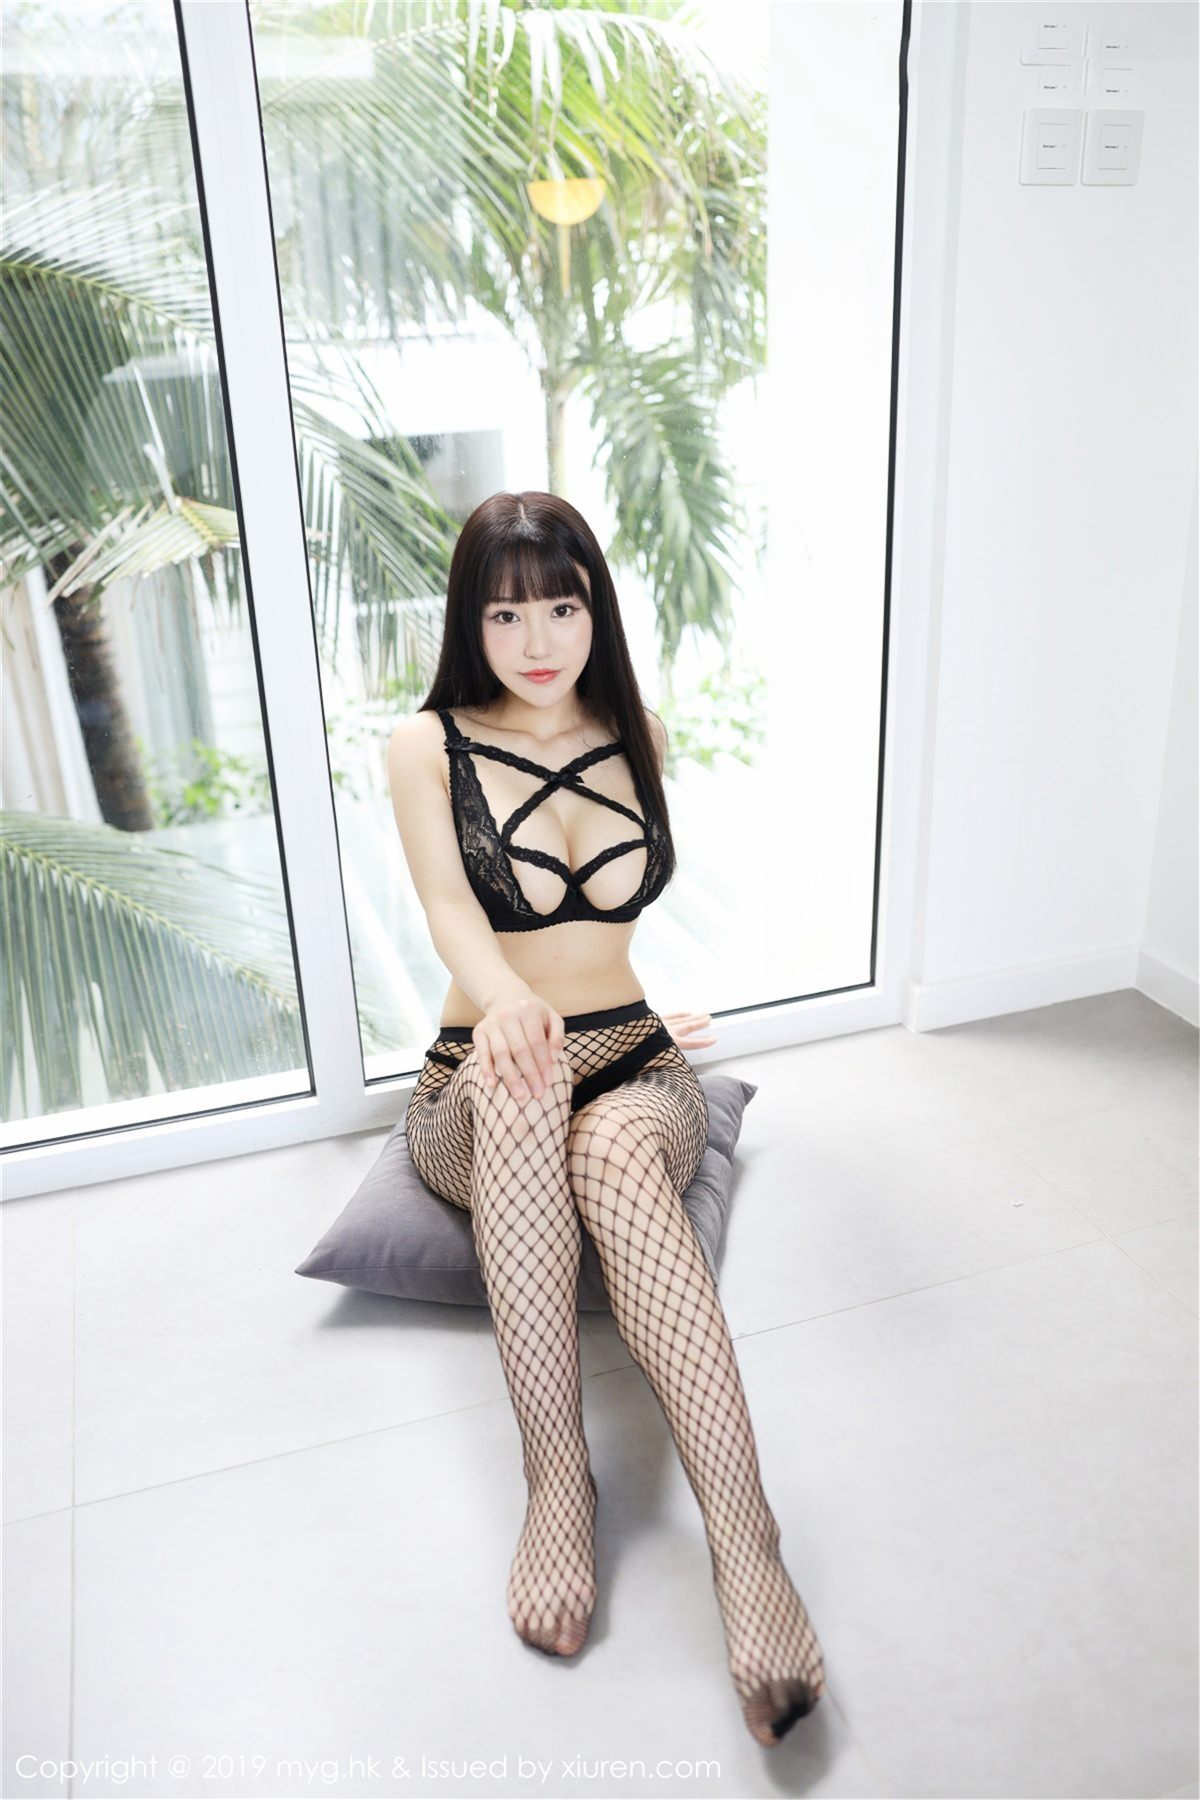 MyGirl Vol.357 9P, mygirl, Zhu Ke Er